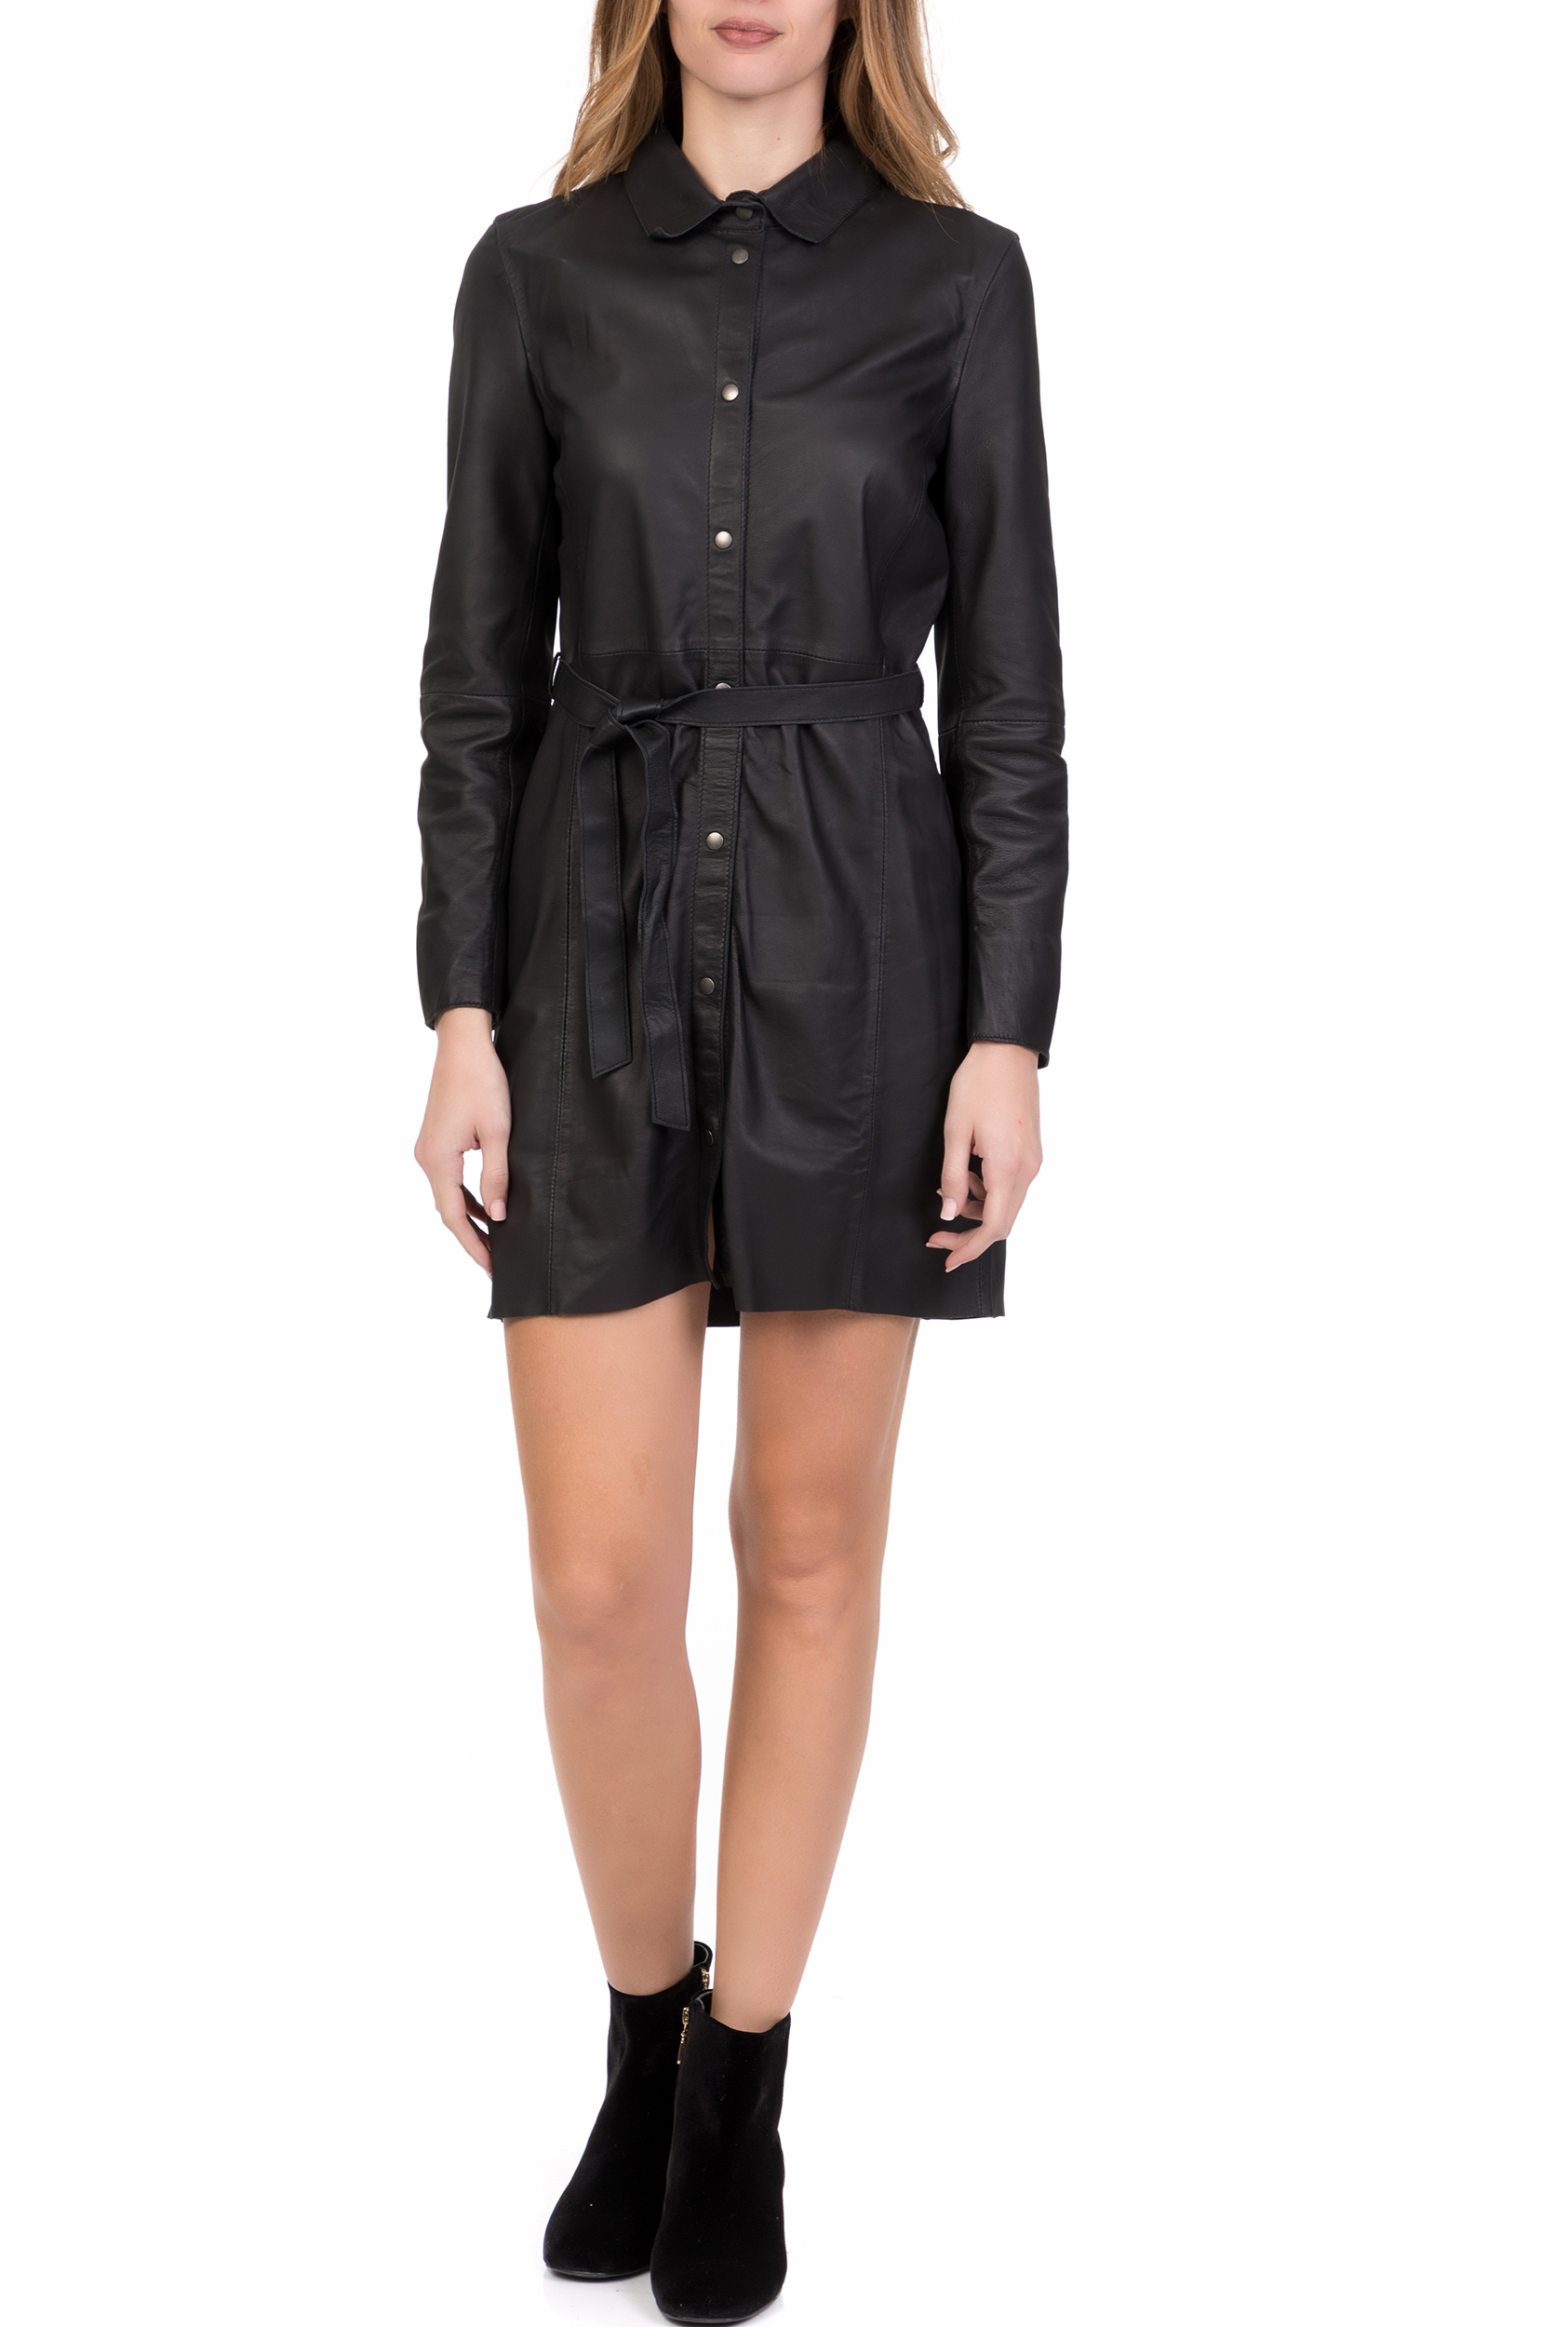 GOOSECRAFT - Γυναικείο δερμάτινο μίνι φόρεμα AZELIA GOOSECRAFT μαύρο γυναικεία ρούχα φόρεματα μίνι